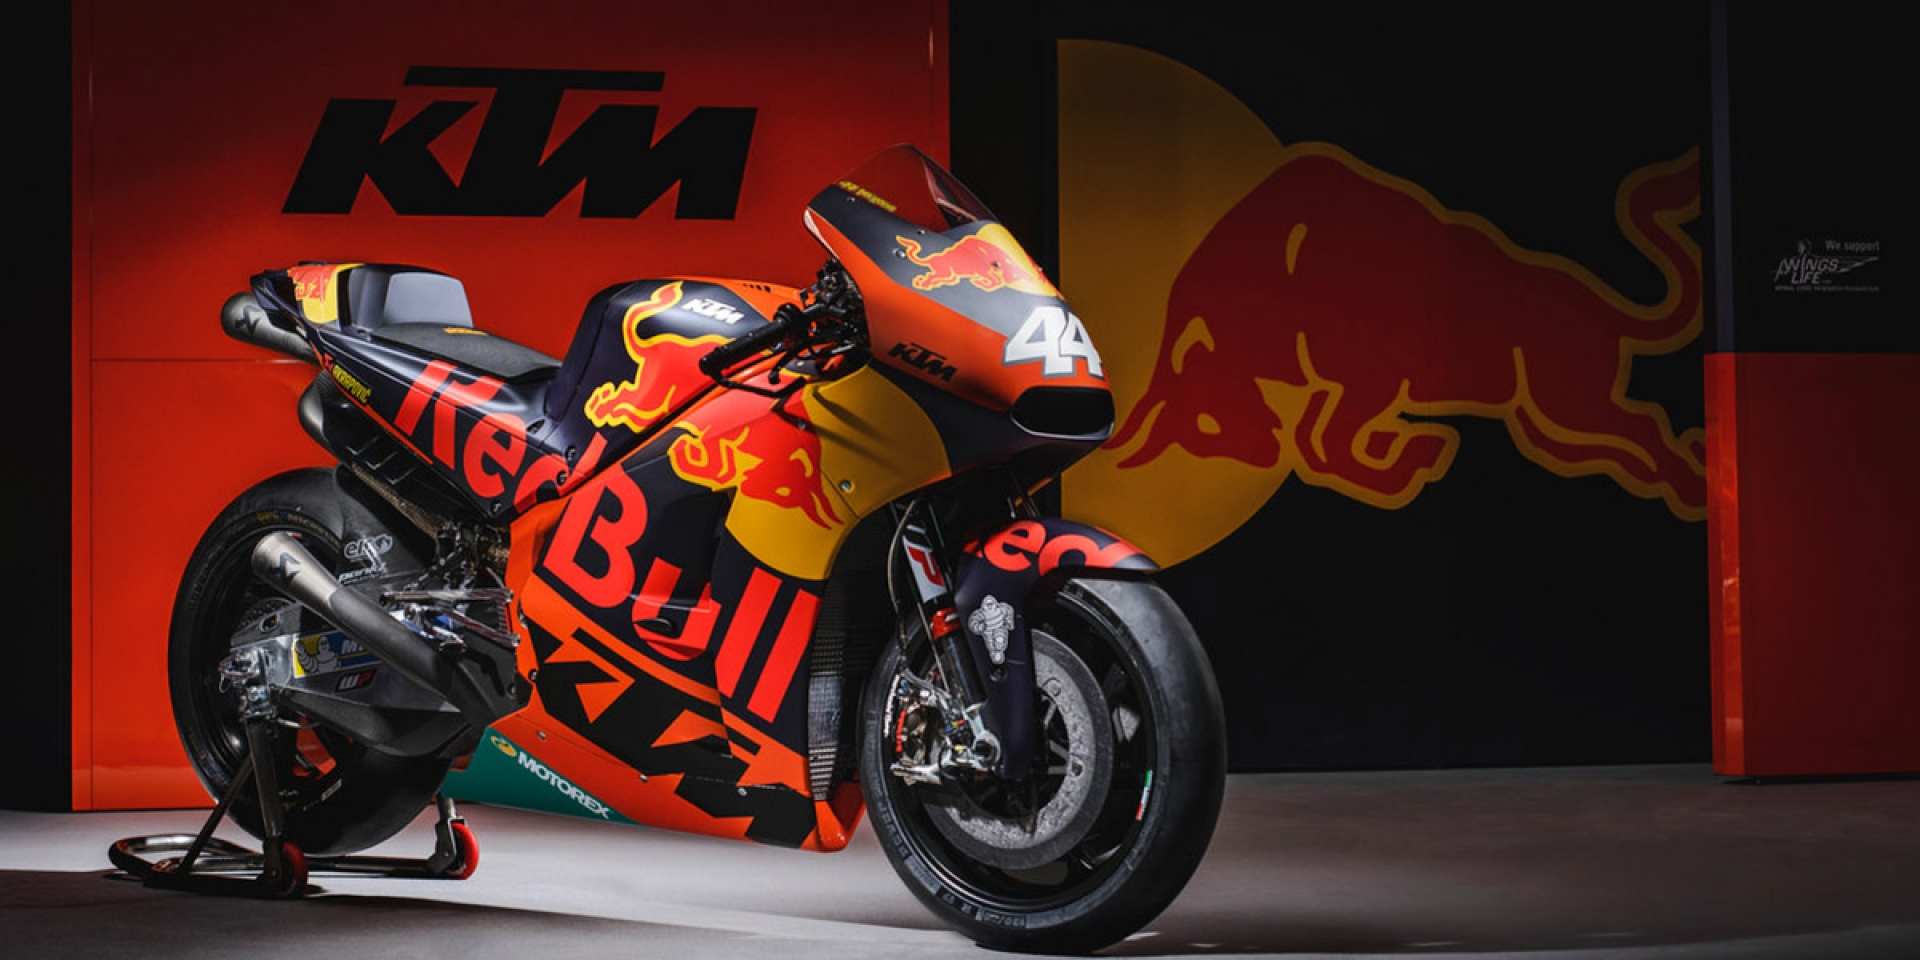 2017 MotoGP KTM Red Bull Racing Team參賽塗裝發表!